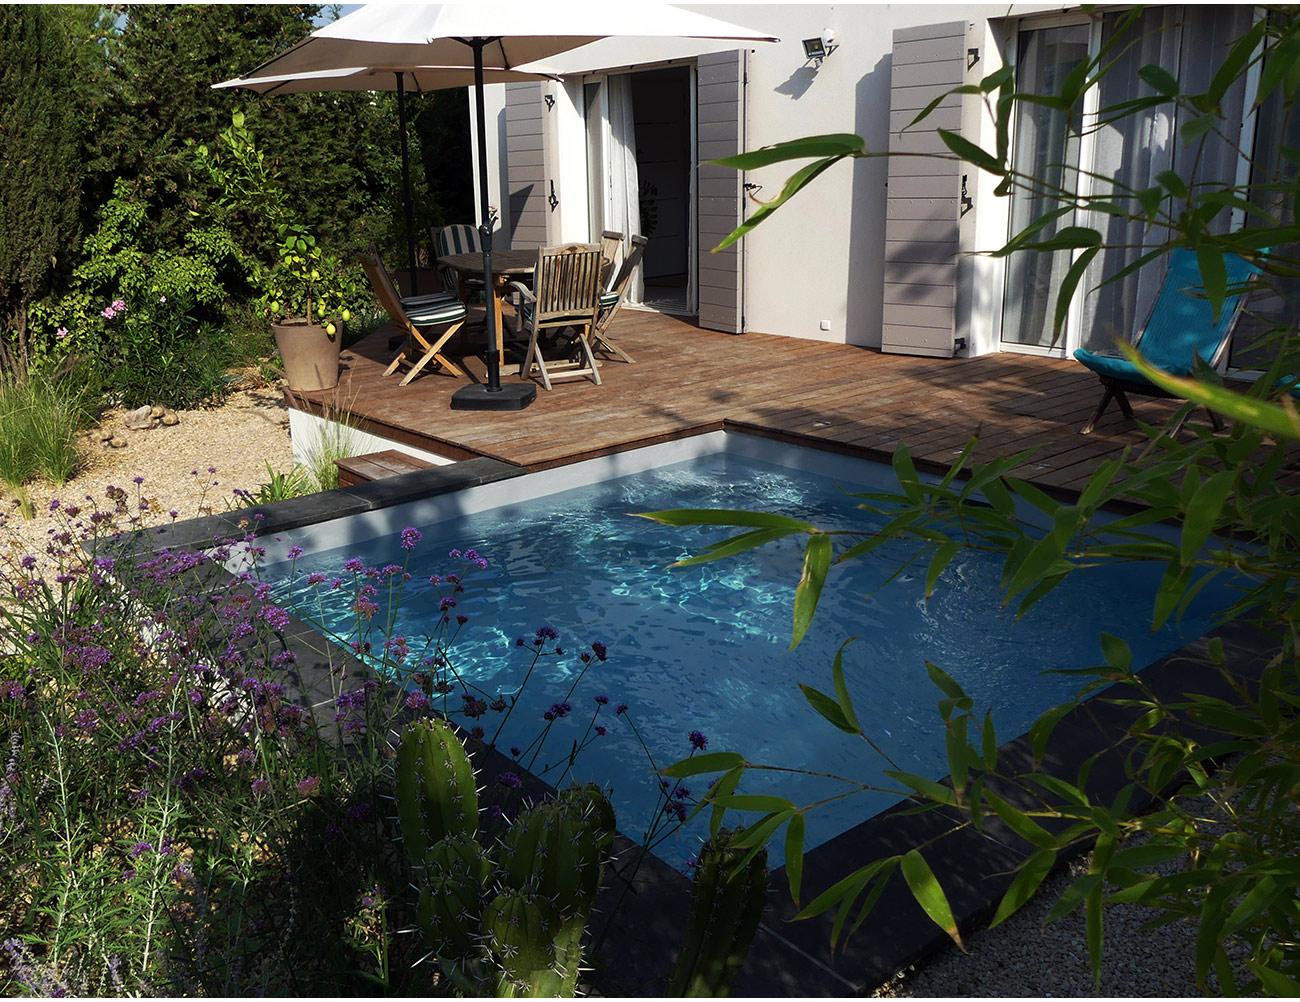 Jardin cologique luxuriant micro piscine carr e en for Ambiance jardin paysagiste